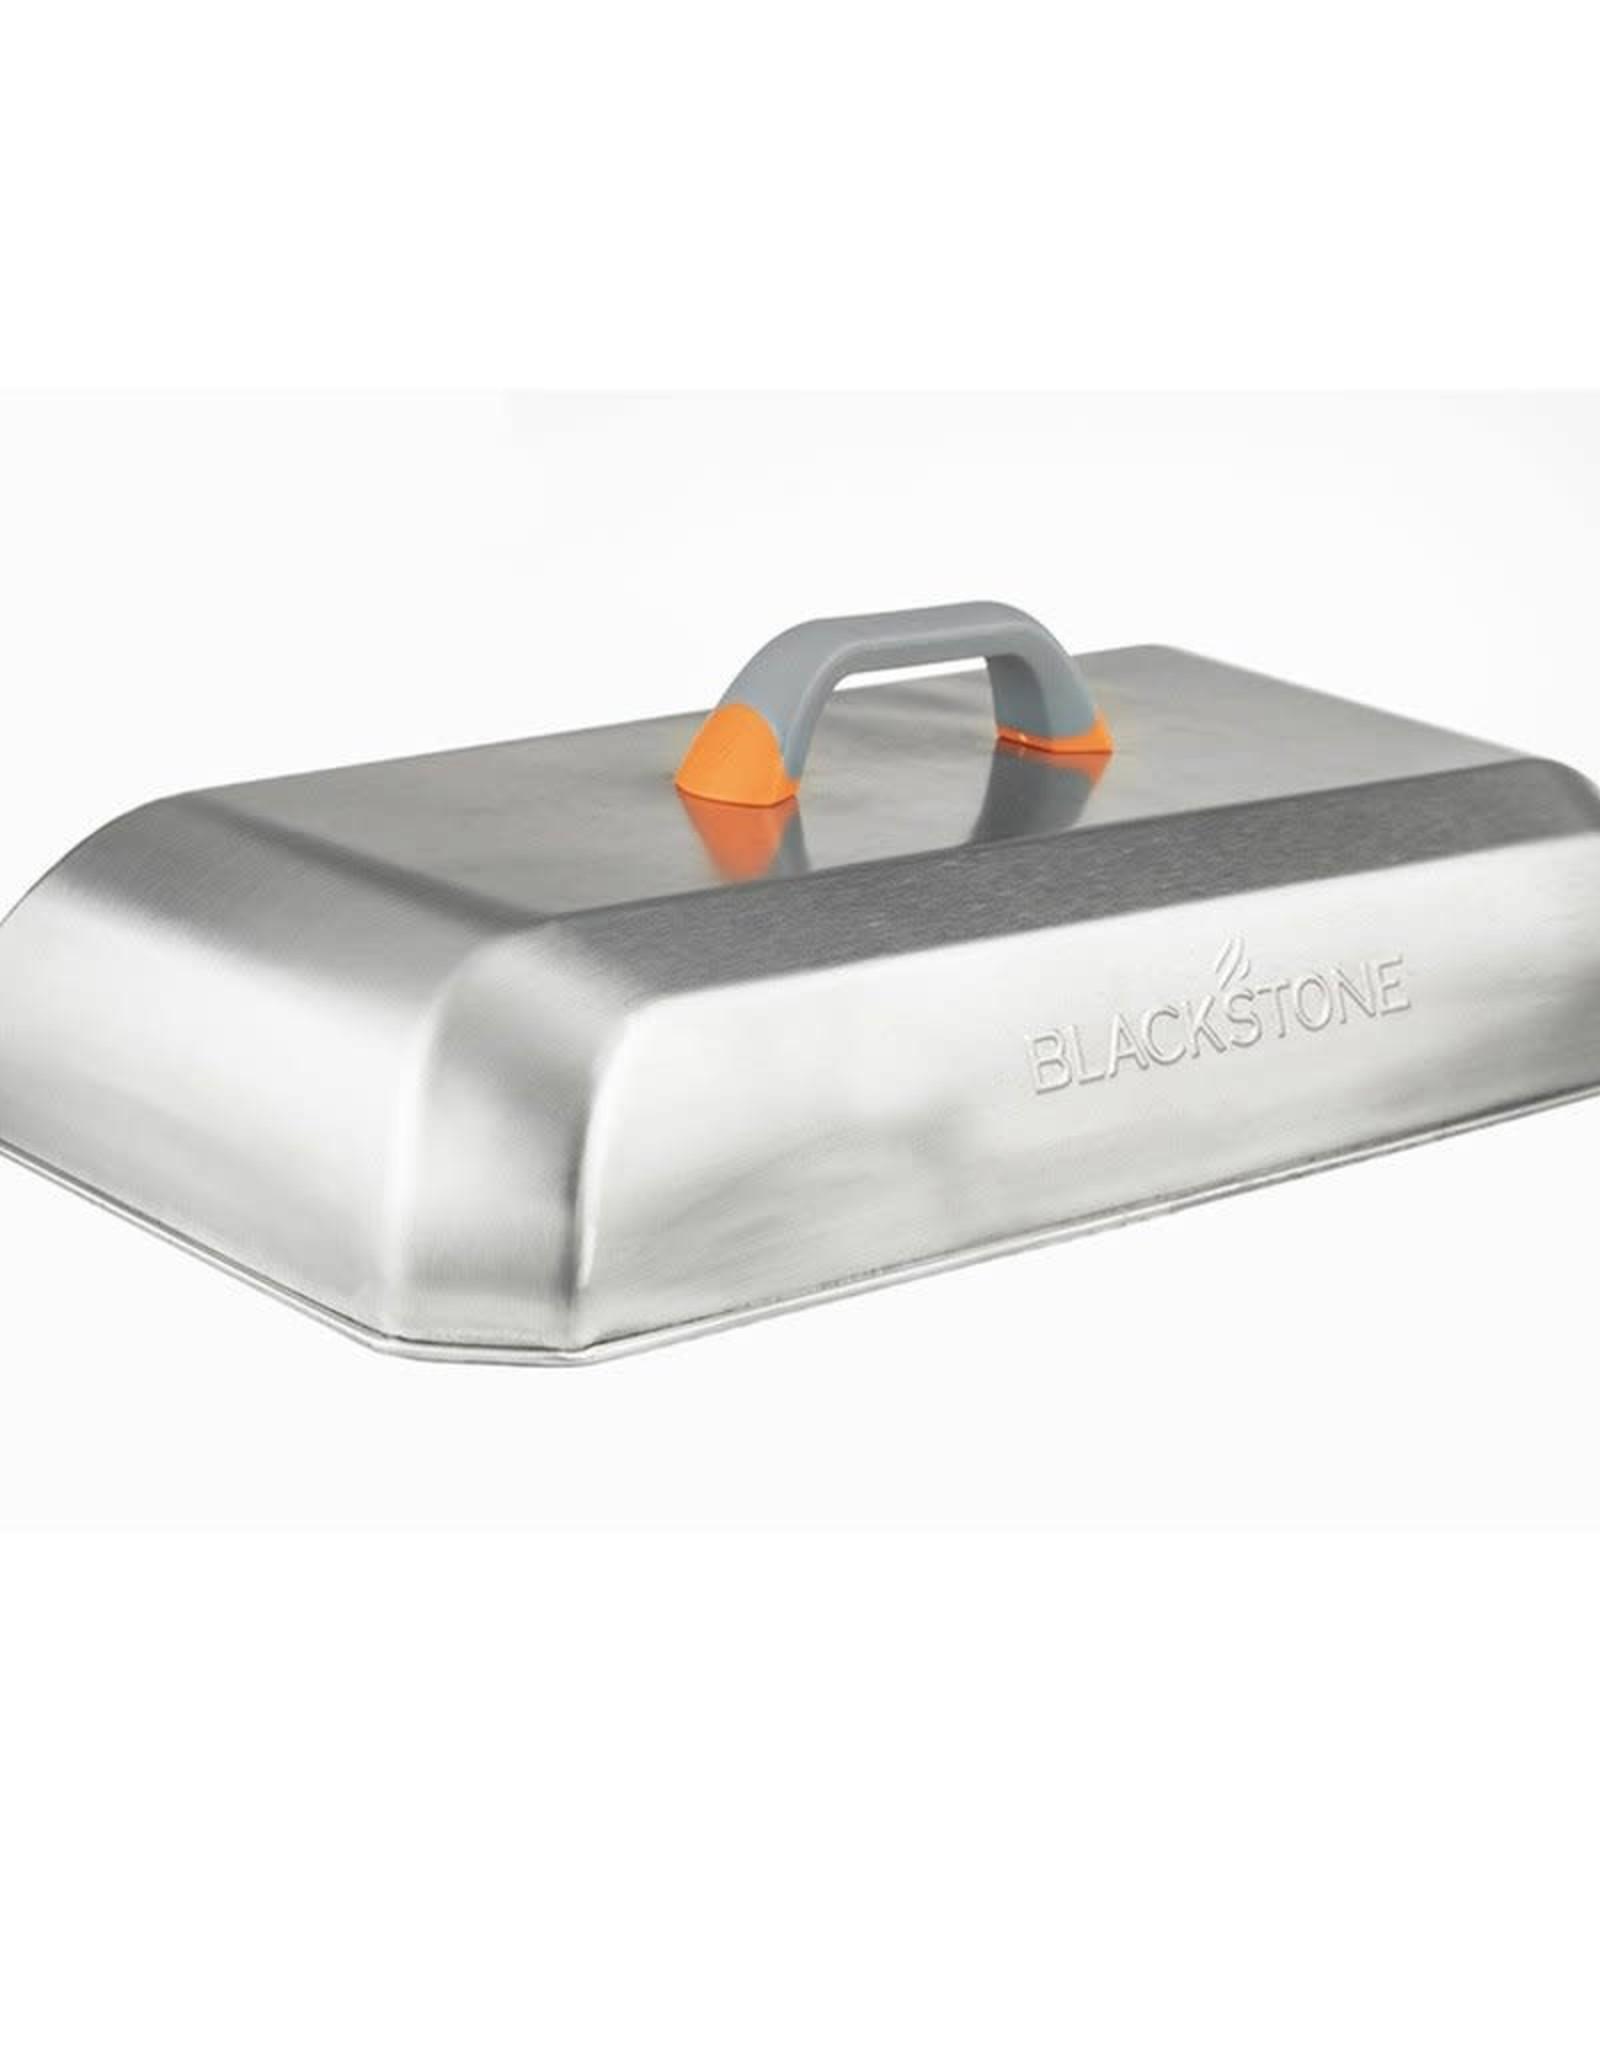 Blackstone Blackstone Signature XL Basting Cover 5208